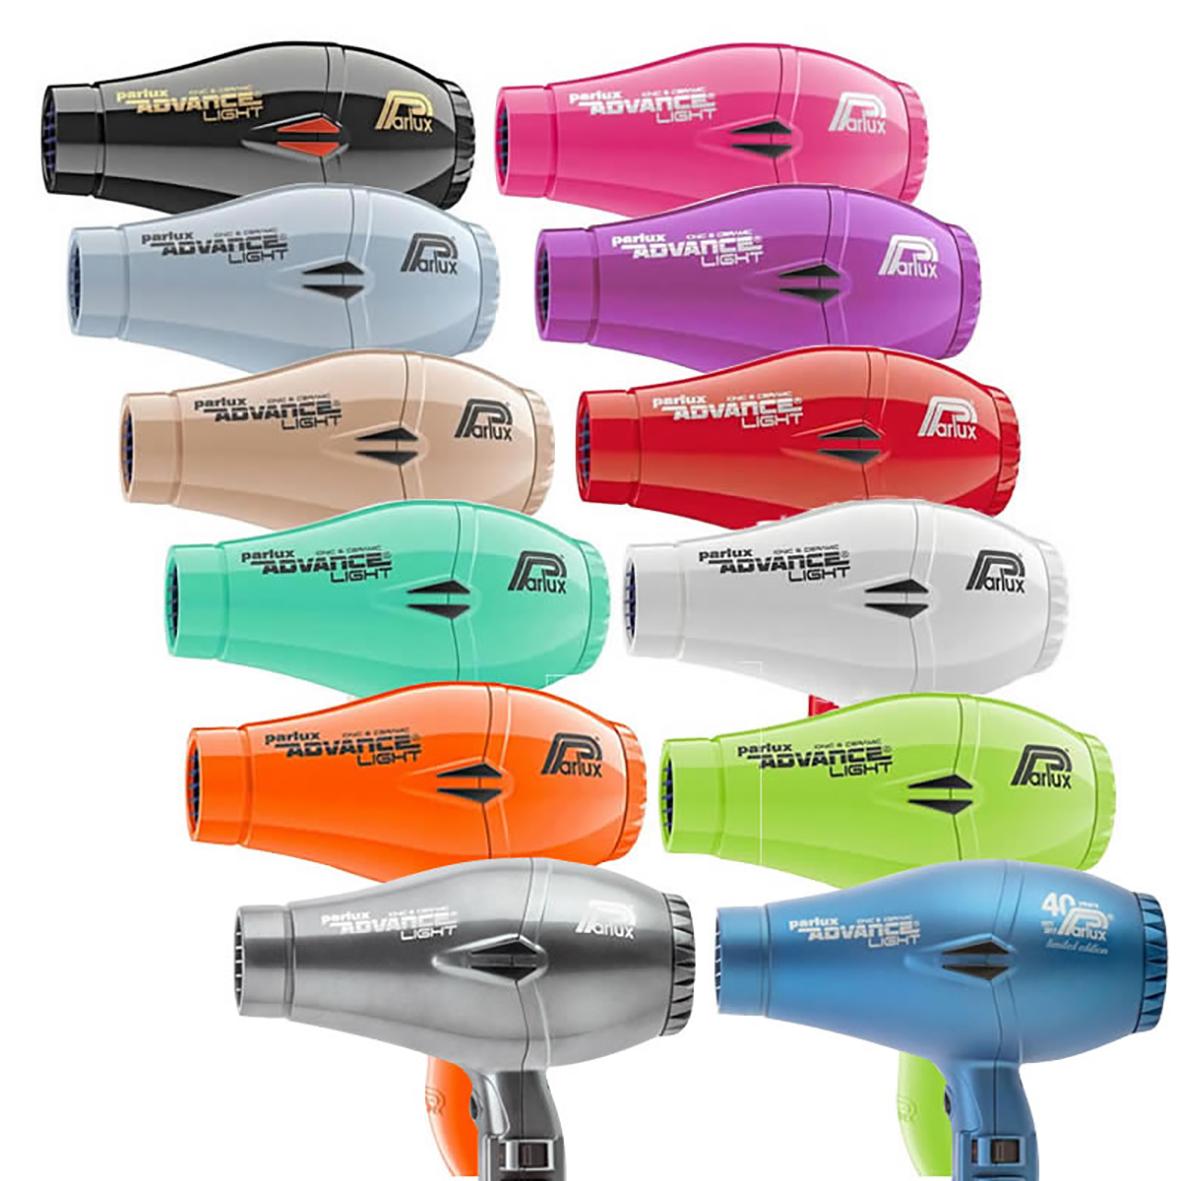 02 Asciugacapelli Parlux Advance Light Ionic&Ceramic